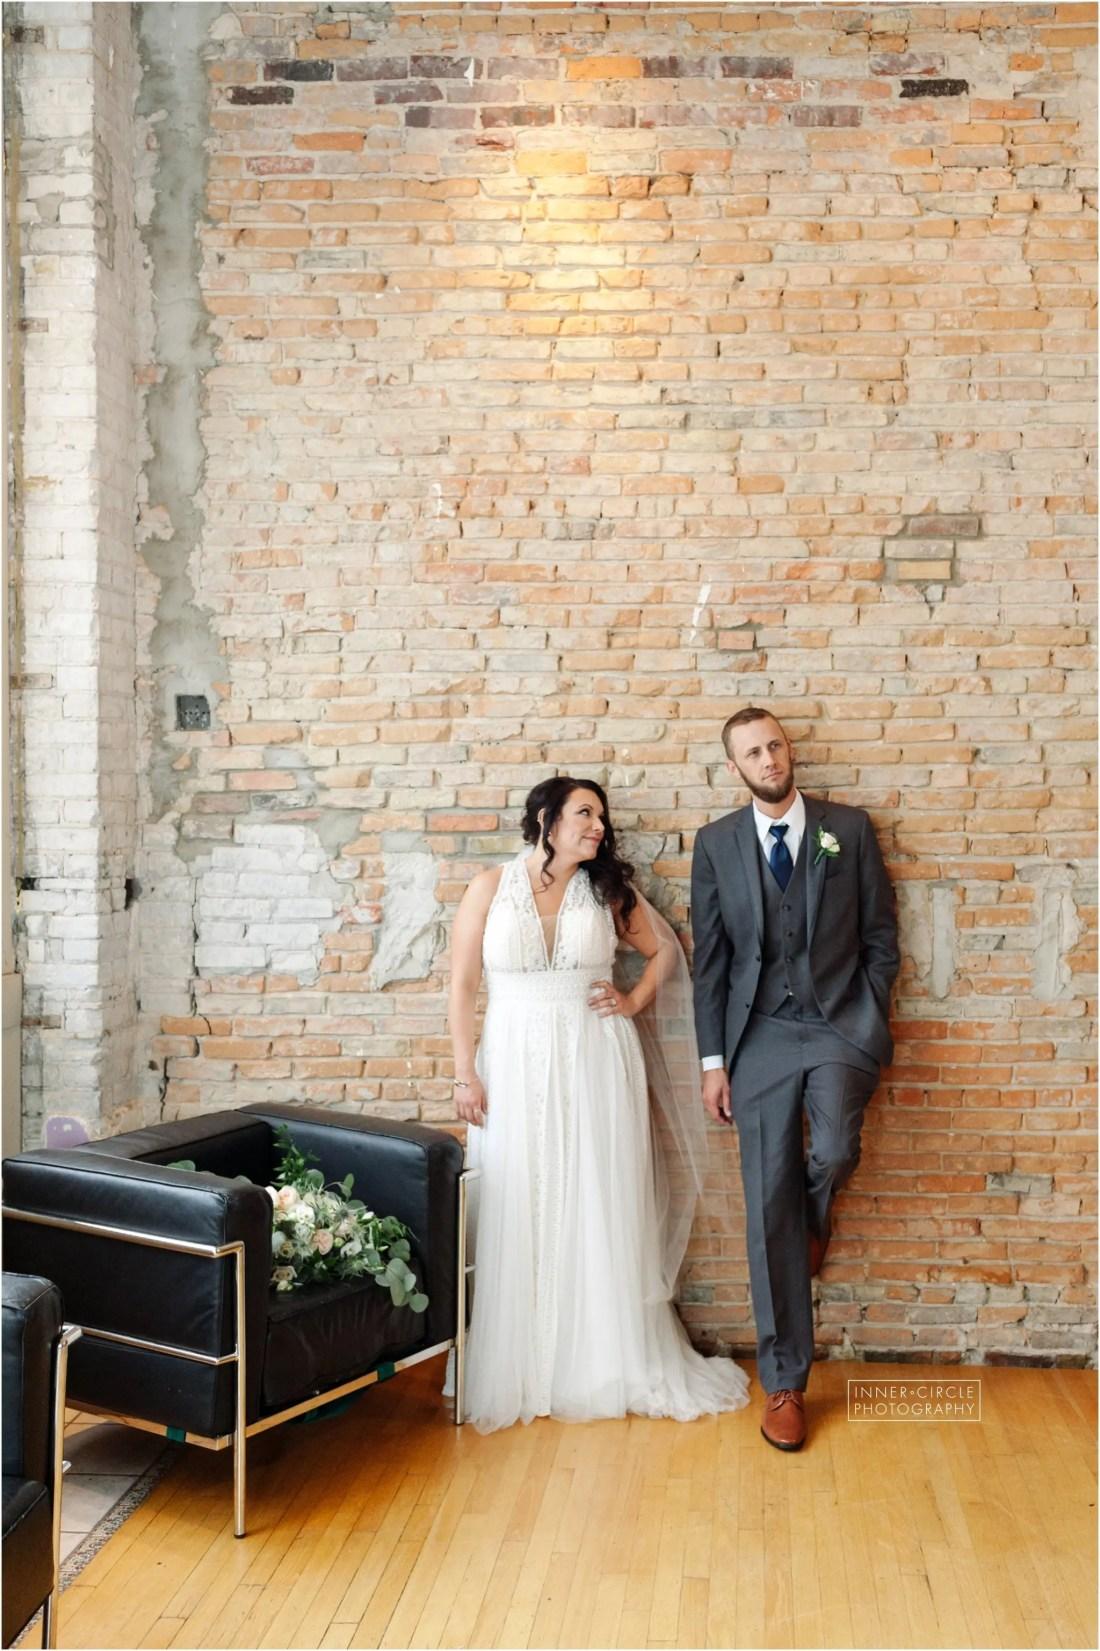 JoeMelissa_WED_InnerCirclePhoto_160 Joe + Melissa :: MARRIED!